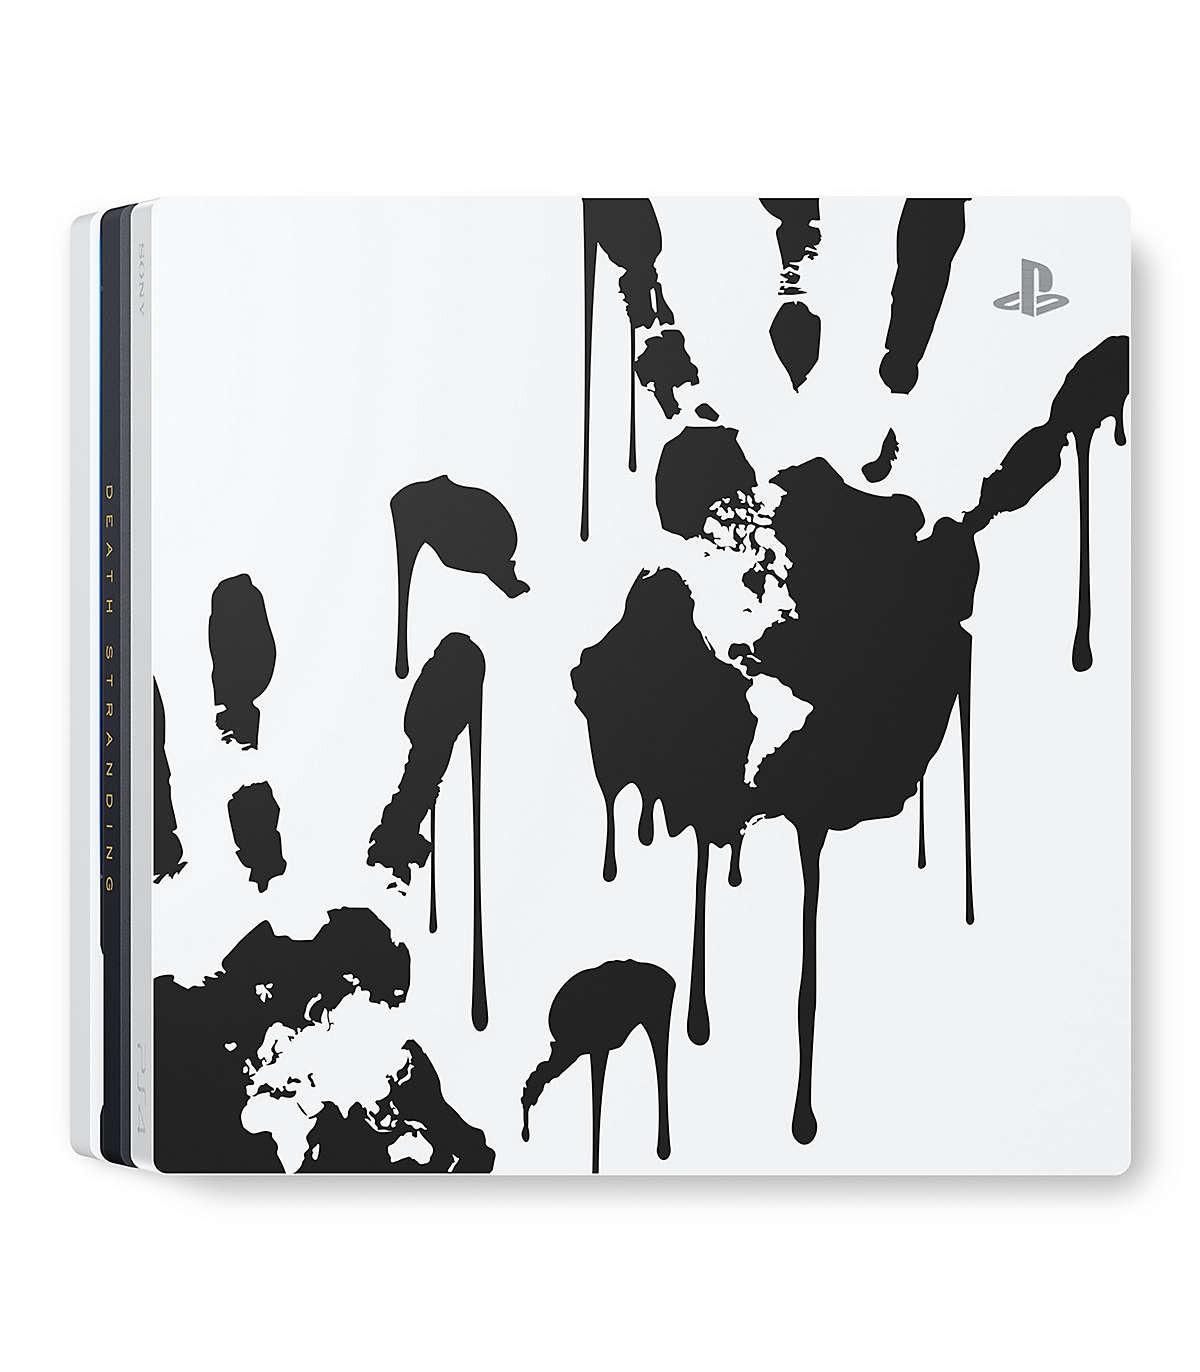 کنسول پلی استیشن 4 پرو باندل Death Stranding Limited Edition